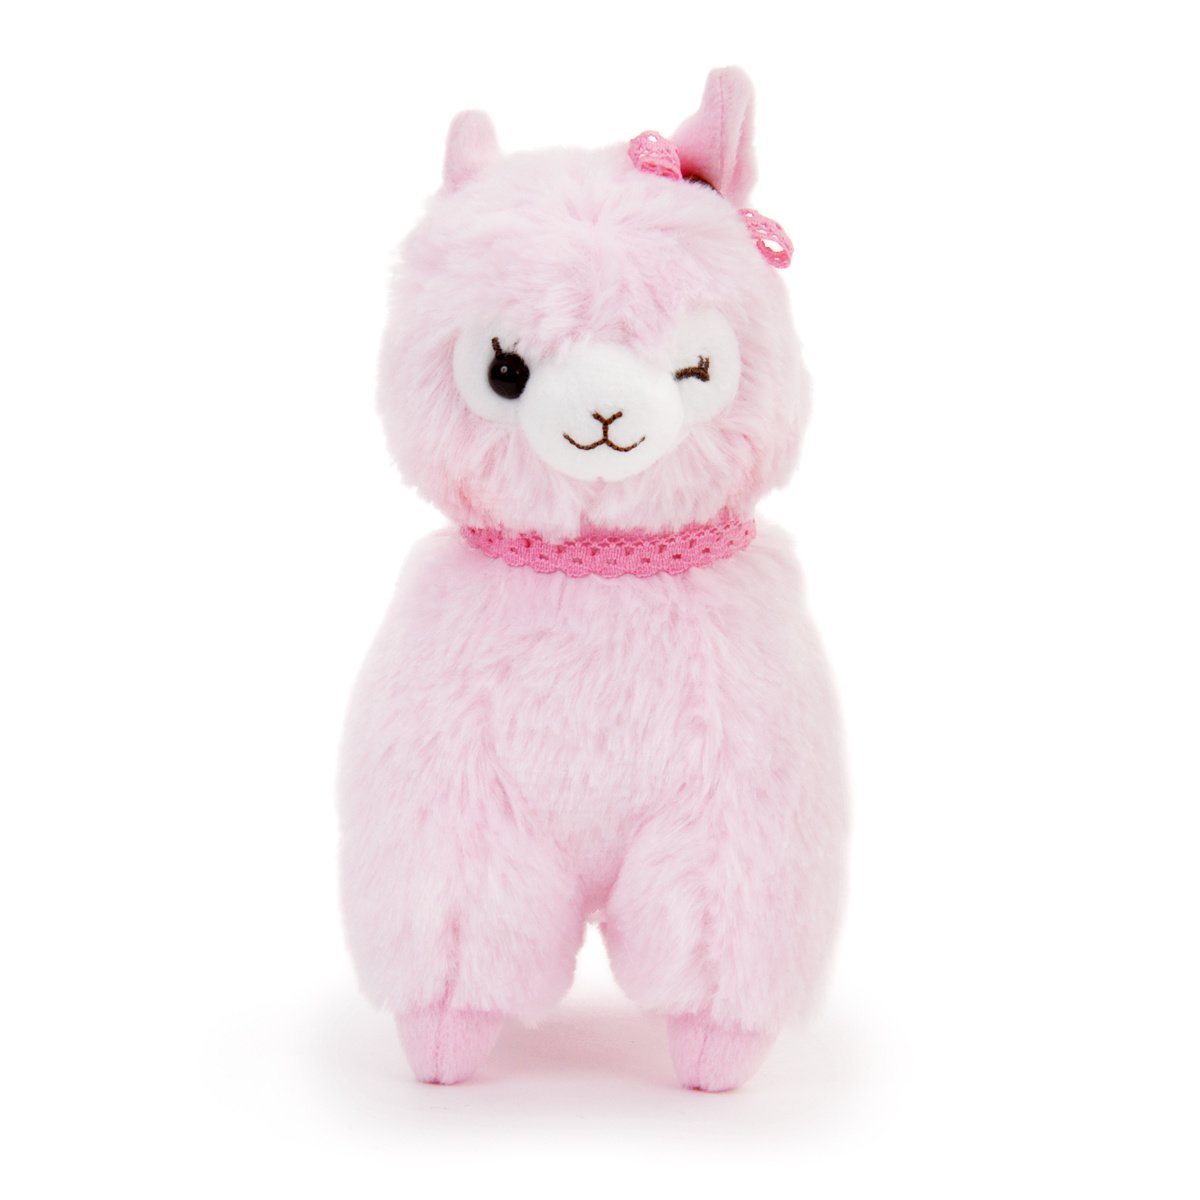 Plush Alpaca, Amuse, Alpacasso, Momo-chan, Pink, 6 Inches